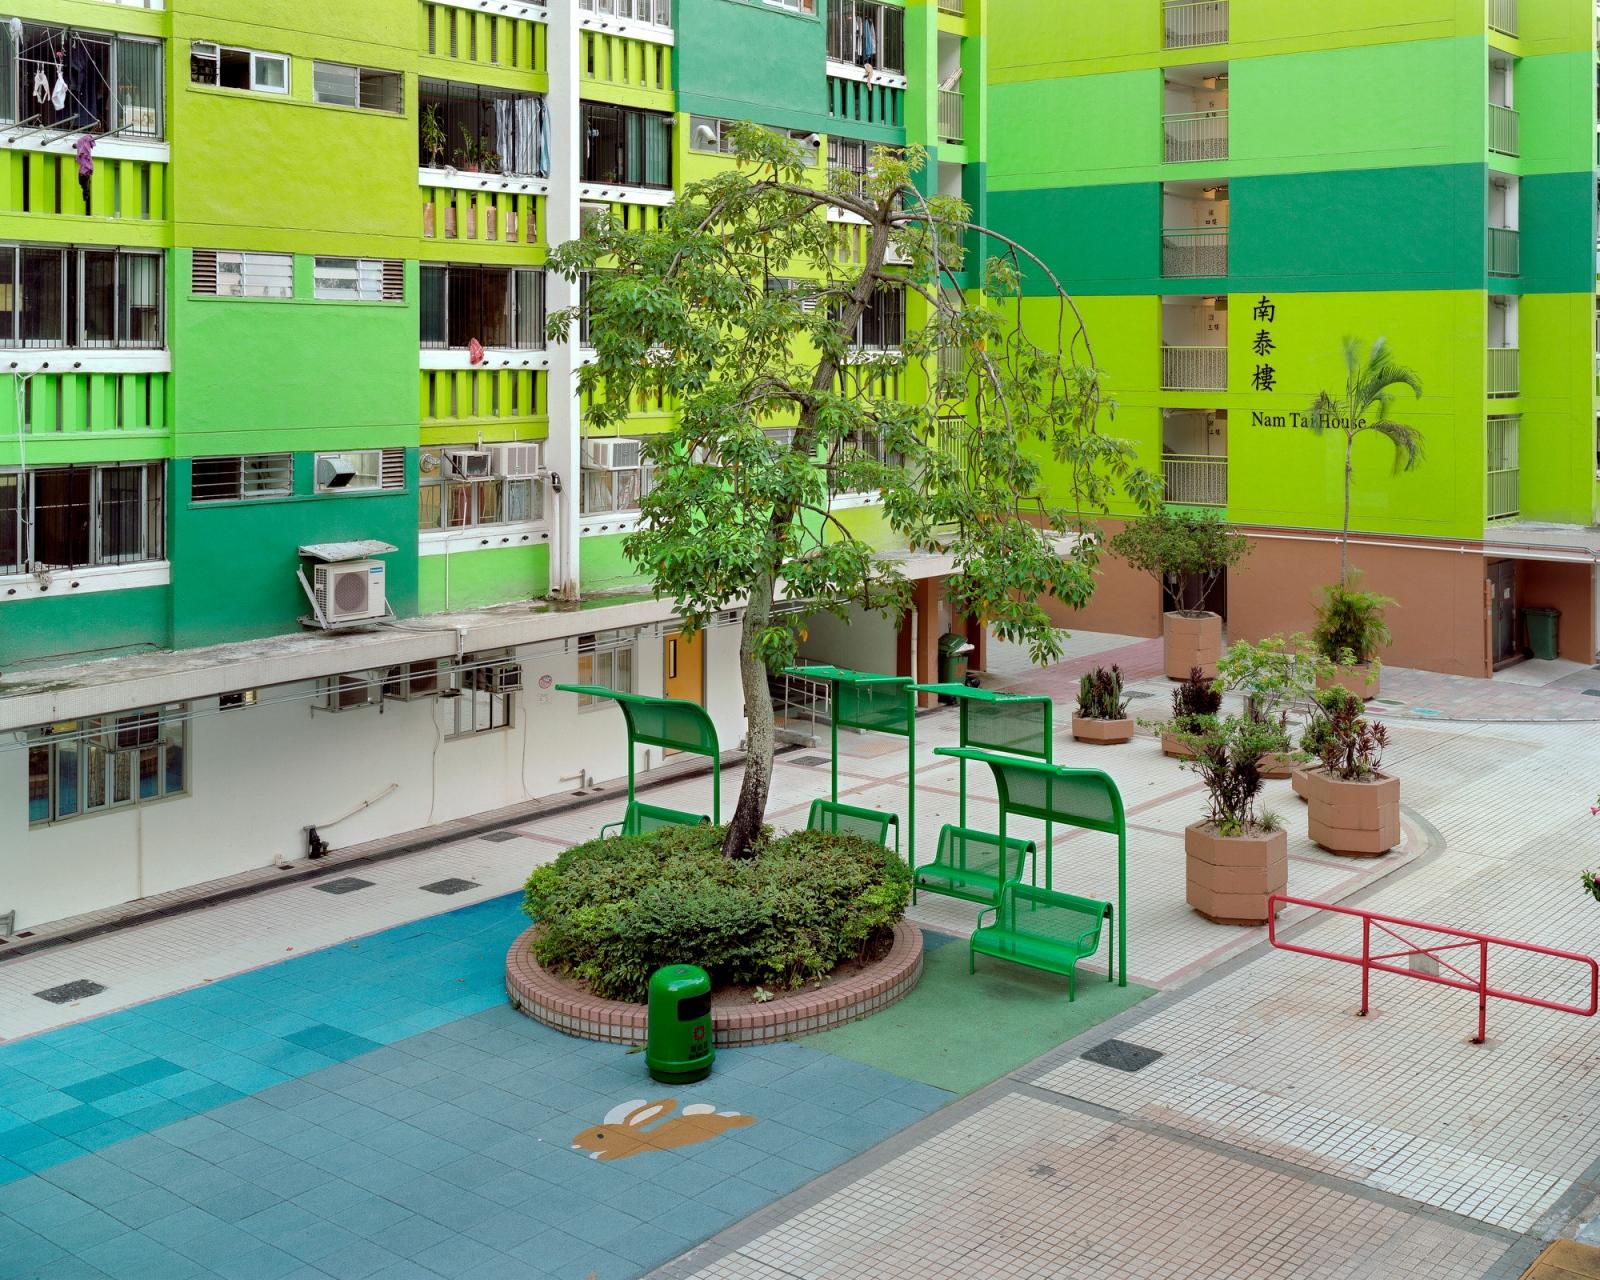 "Nam Shan Estate, 10/2010 Archival Pigment Inkjet Print 28.8"" x 36"" / 40"" x 50"""